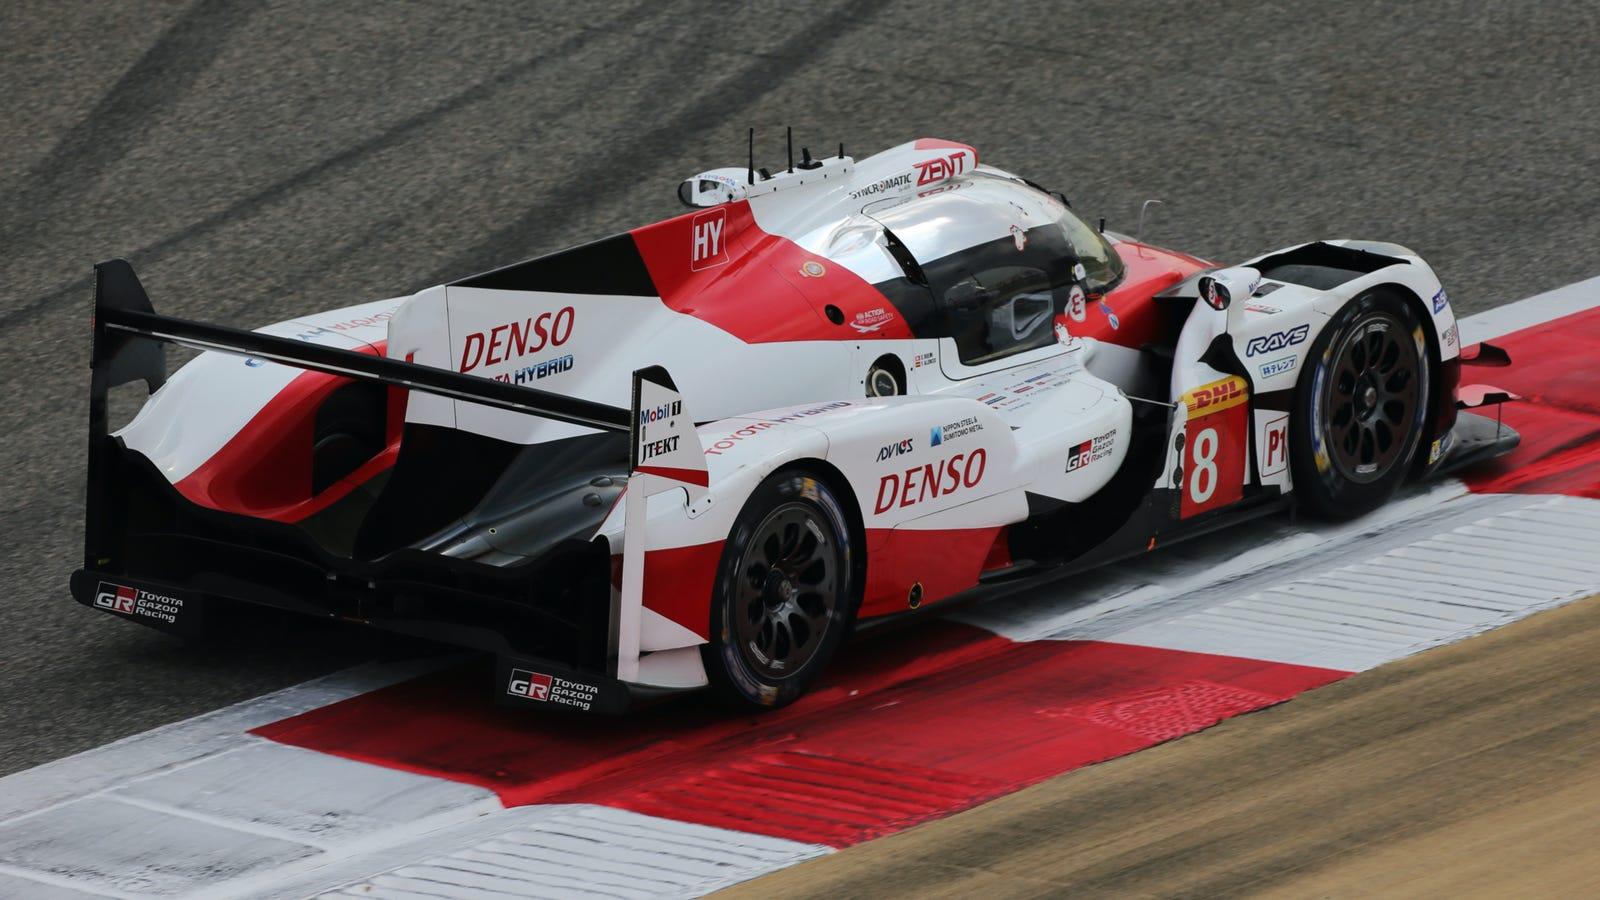 Toyota Will Keep Racing Its Le Mans Prototype Next Season